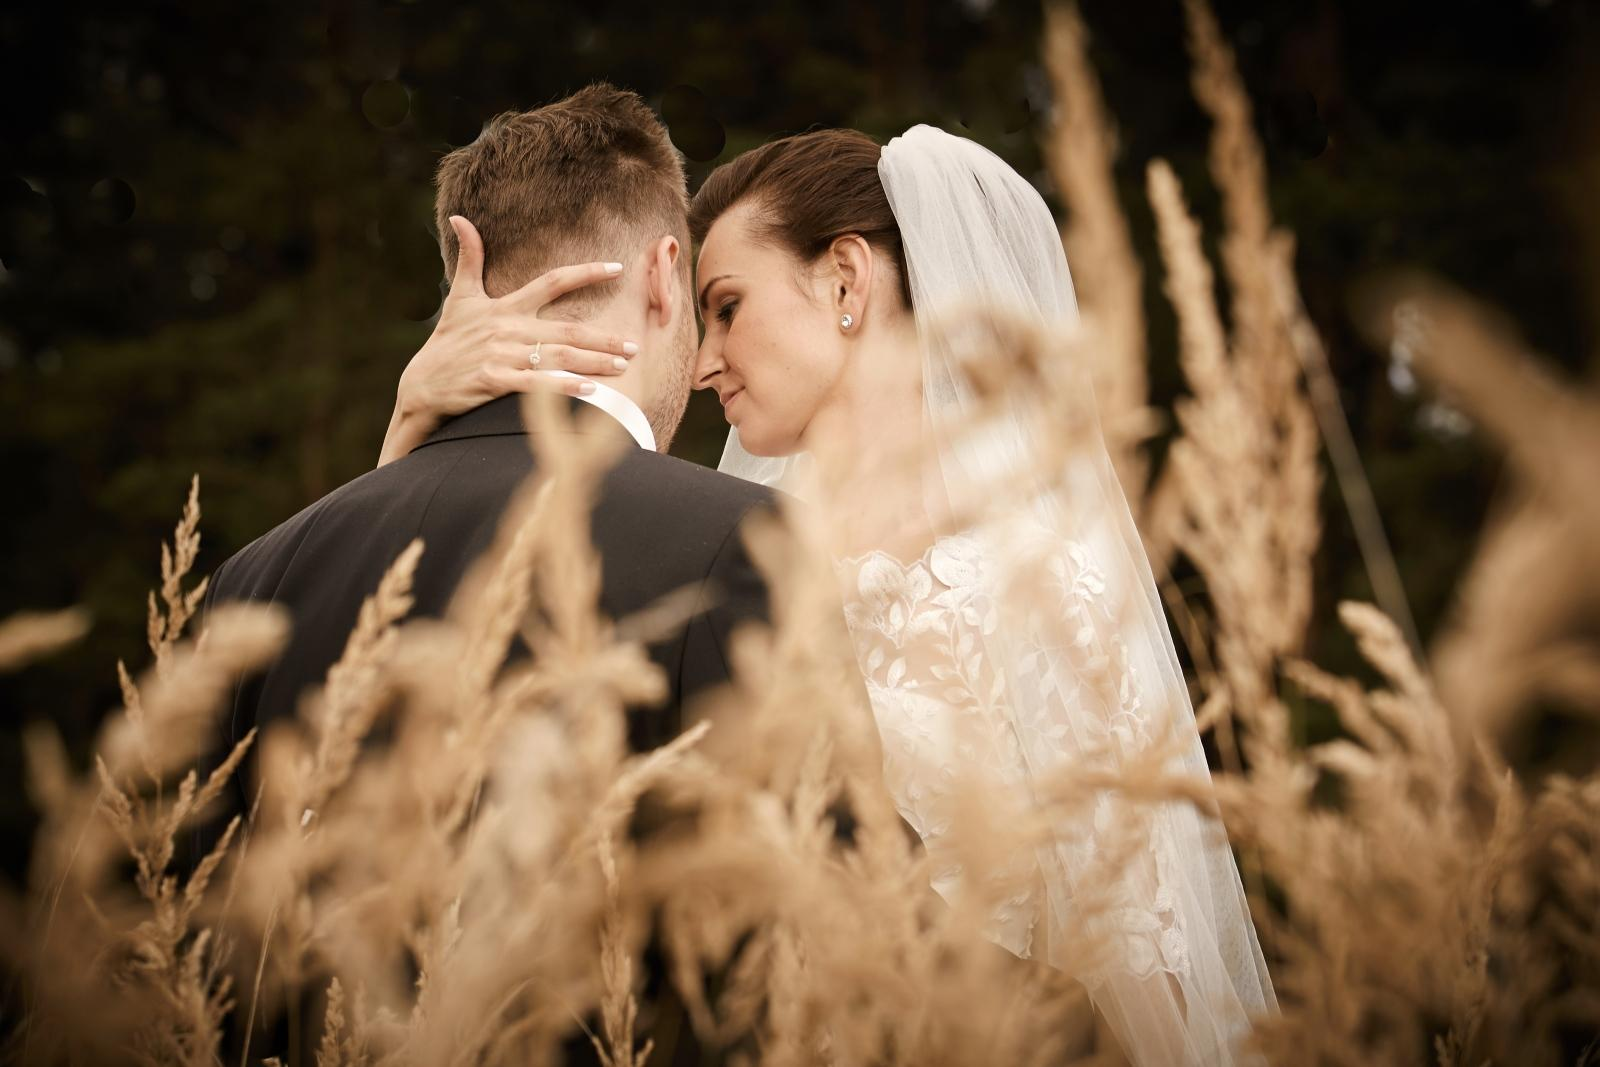 Svadba M+M - Obrázok č. 6